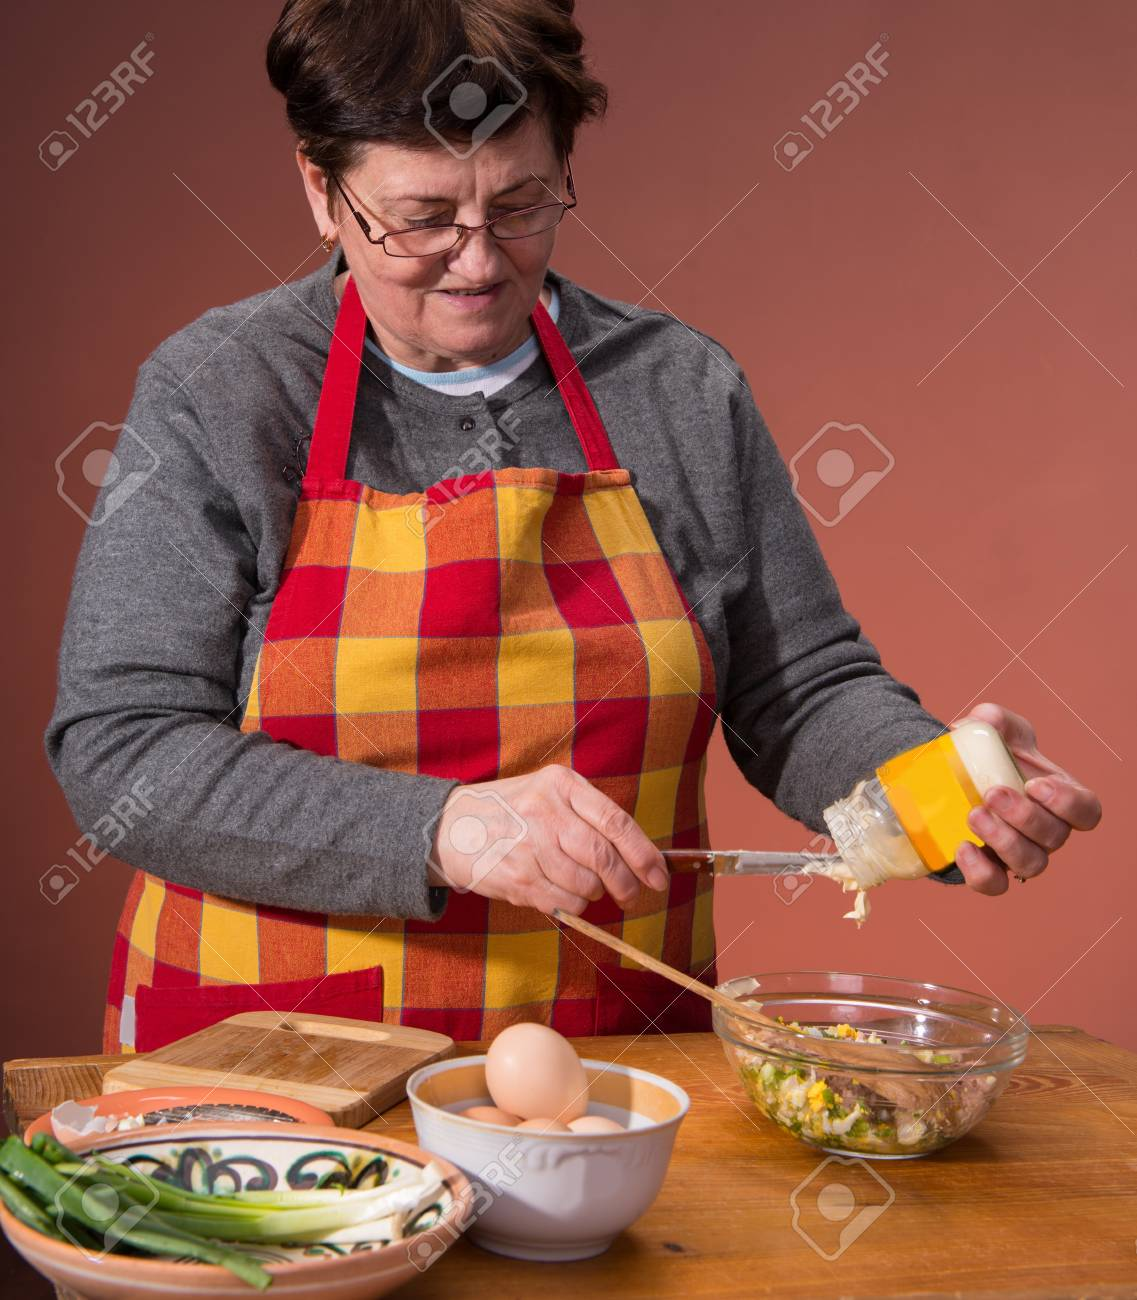 Woman preparing salad  on an orange background Stock Photo - 18434944